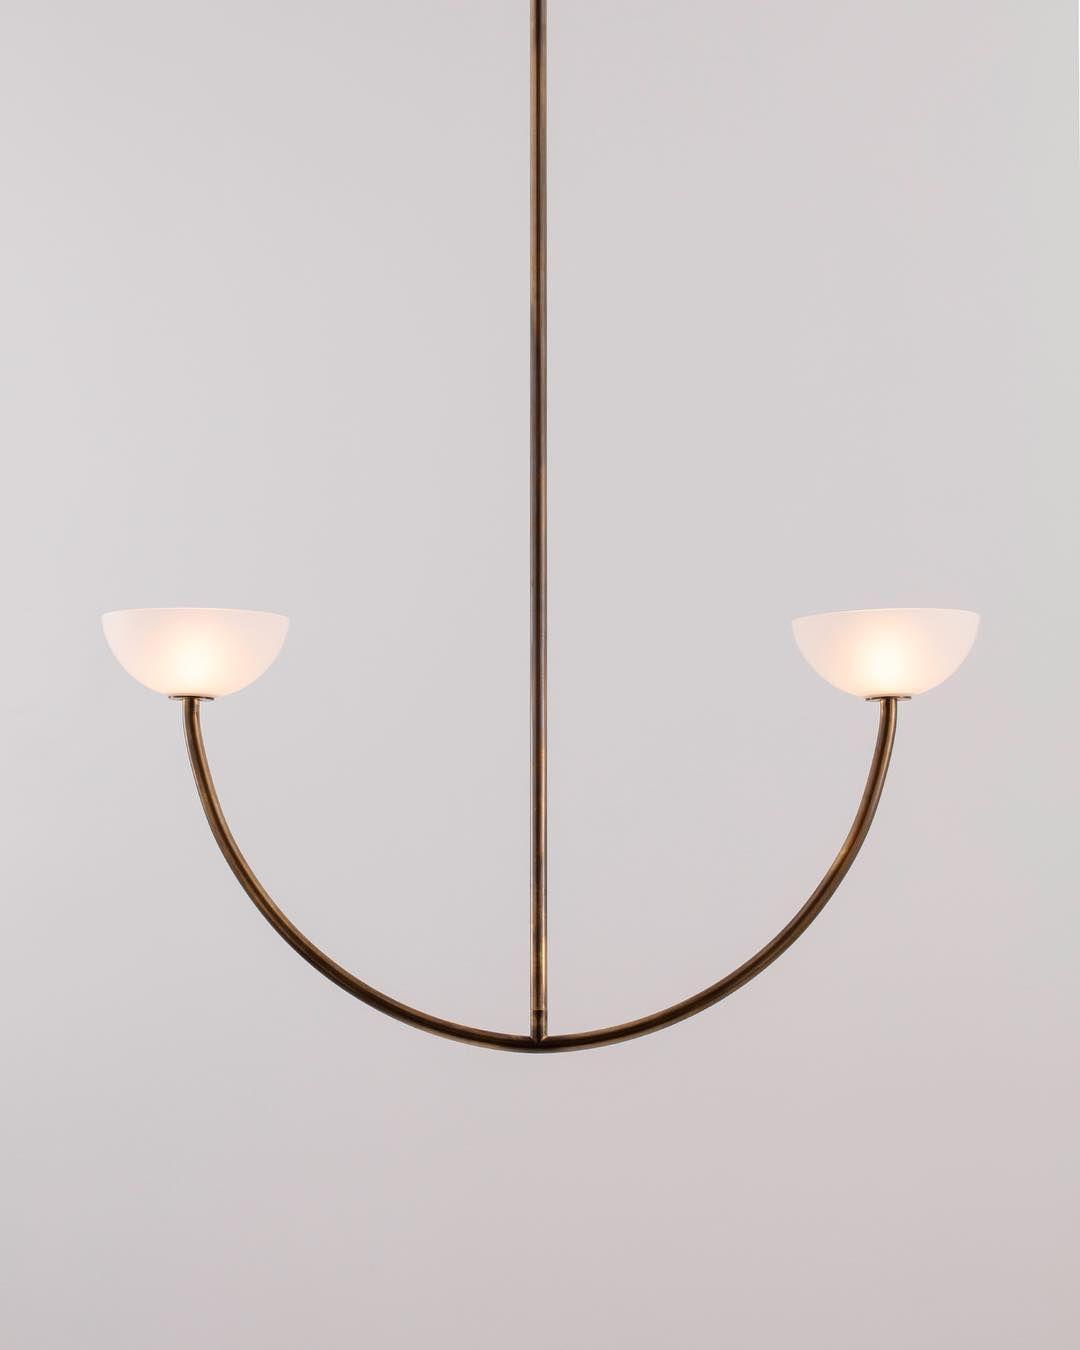 Allied Maker On Instagram 38 Diameter Custom Bend On Our Bright Side Pendant Indoor Lighting Ceiling Lights Light